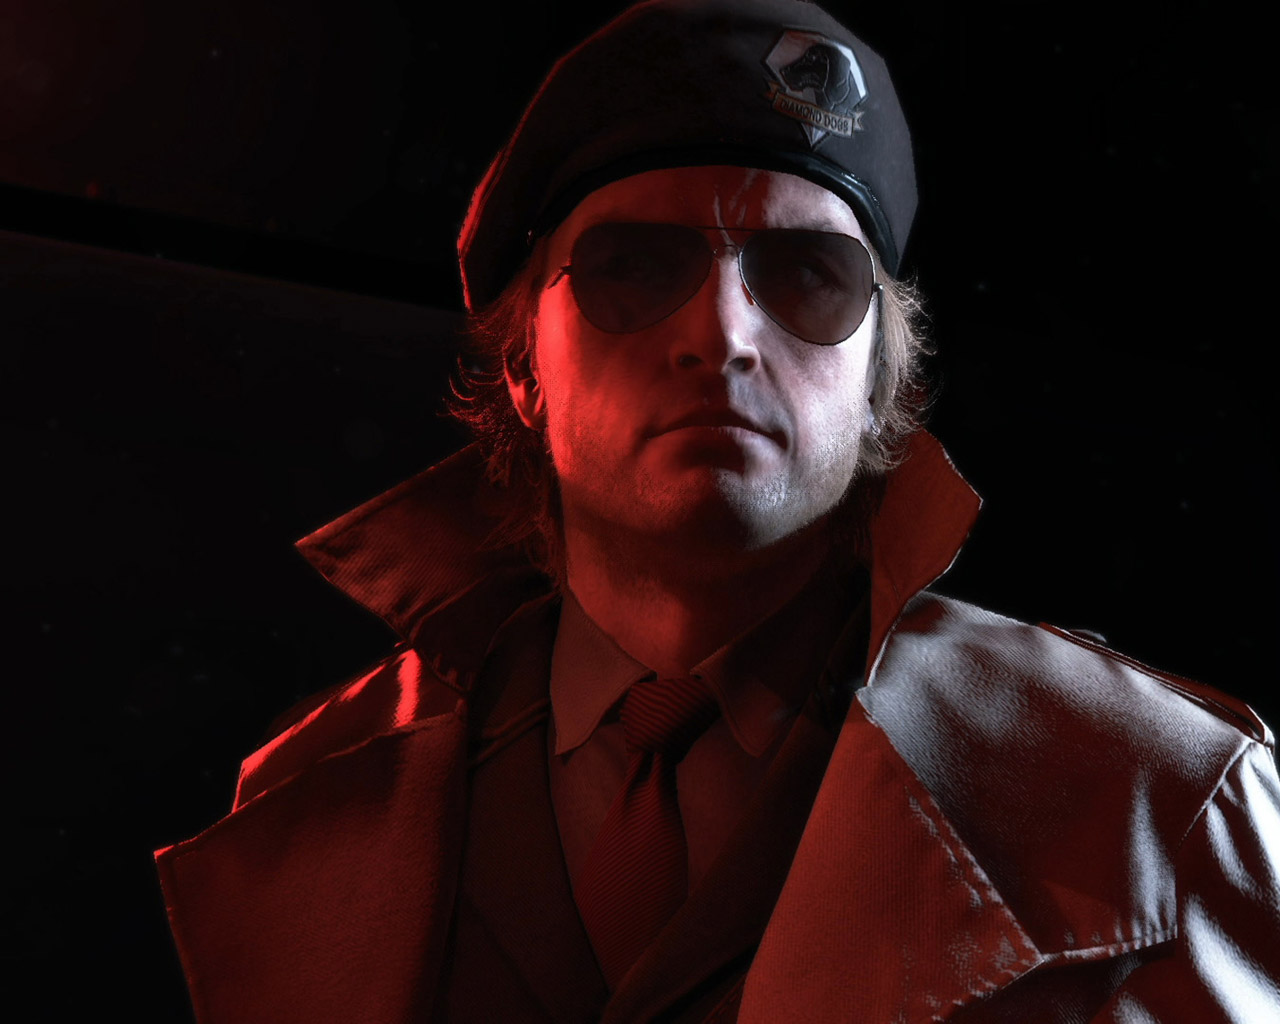 Free Metal Gear Solid V: The Phantom Pain Wallpaper in 1280x1024